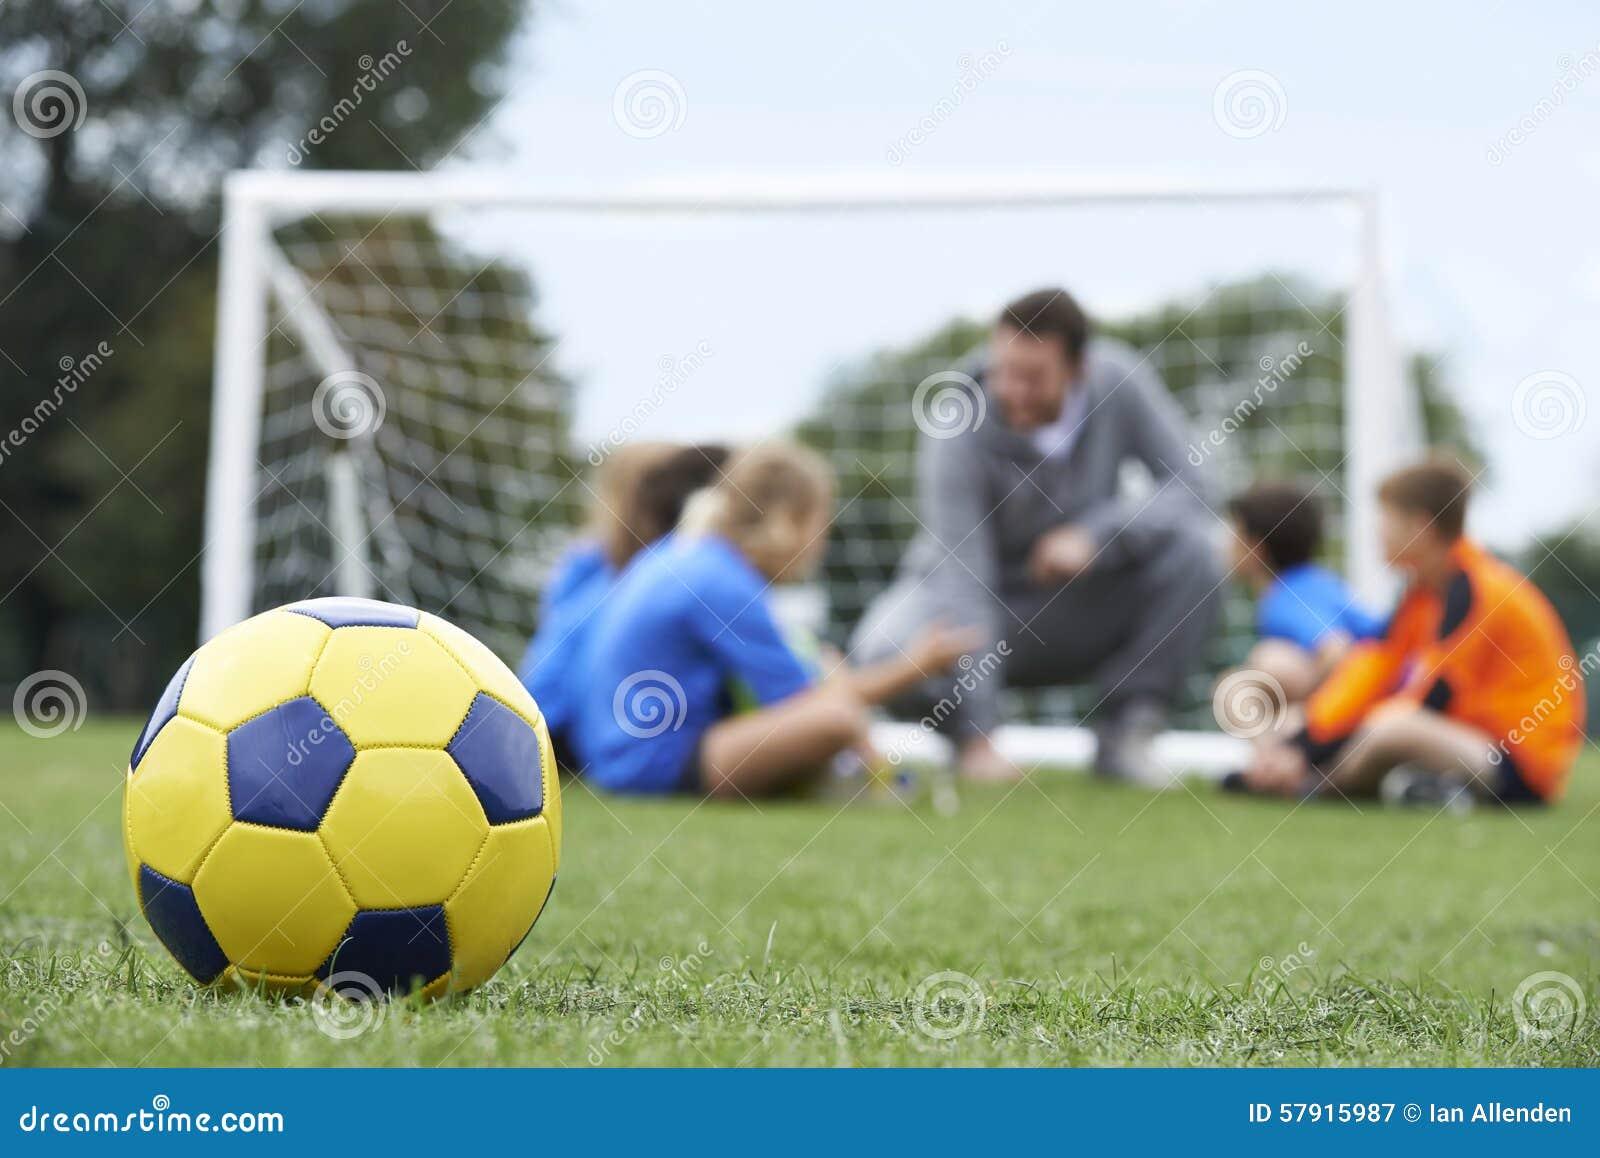 Bola de And Team Discussing Soccer Tactics With del coche en Foregroun